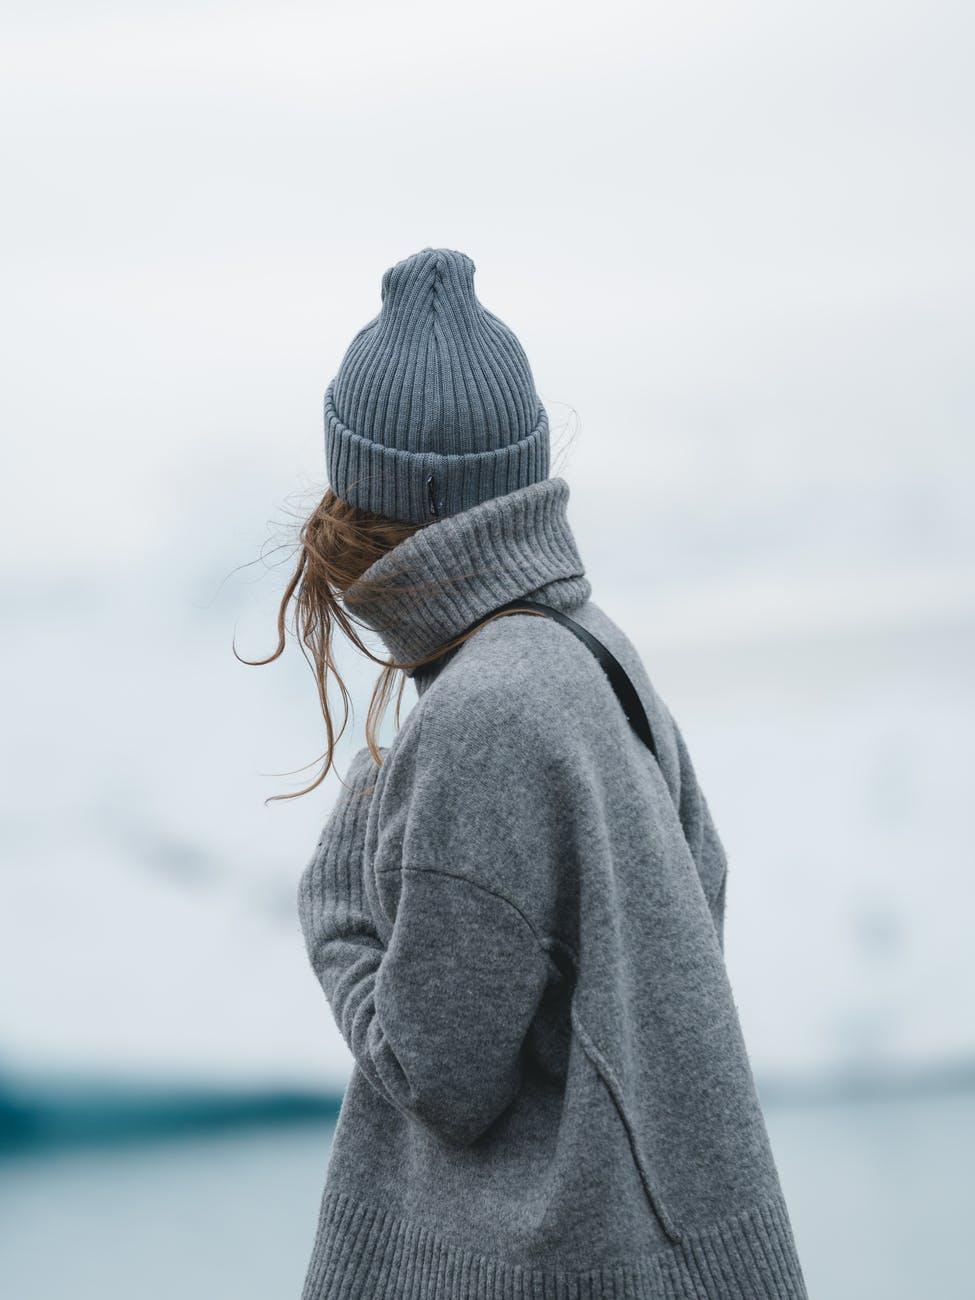 woman in grey jacket